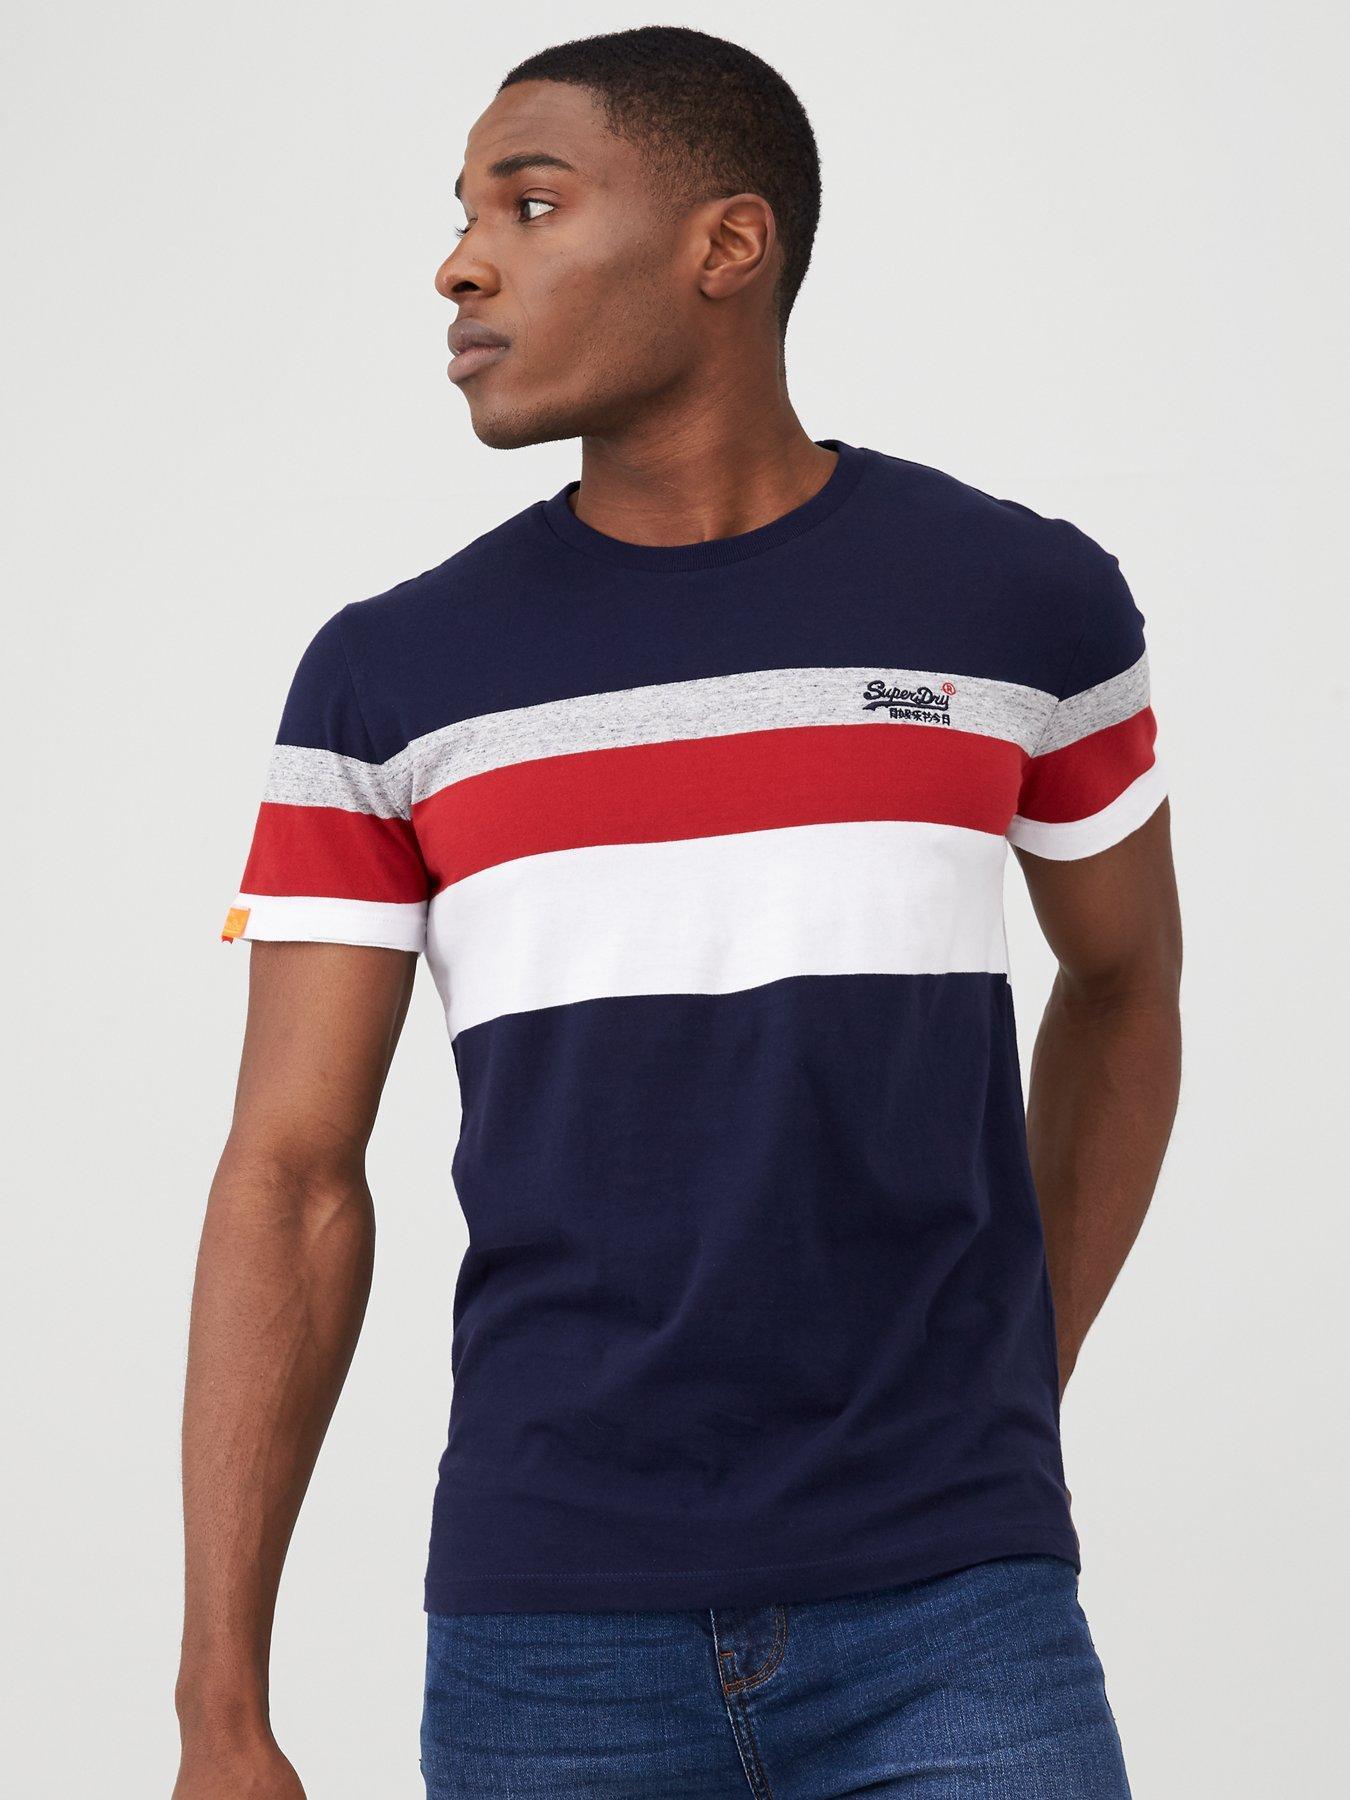 Superdry Orange Label Tipped Sports Stripes T-Shirt Navy 98T